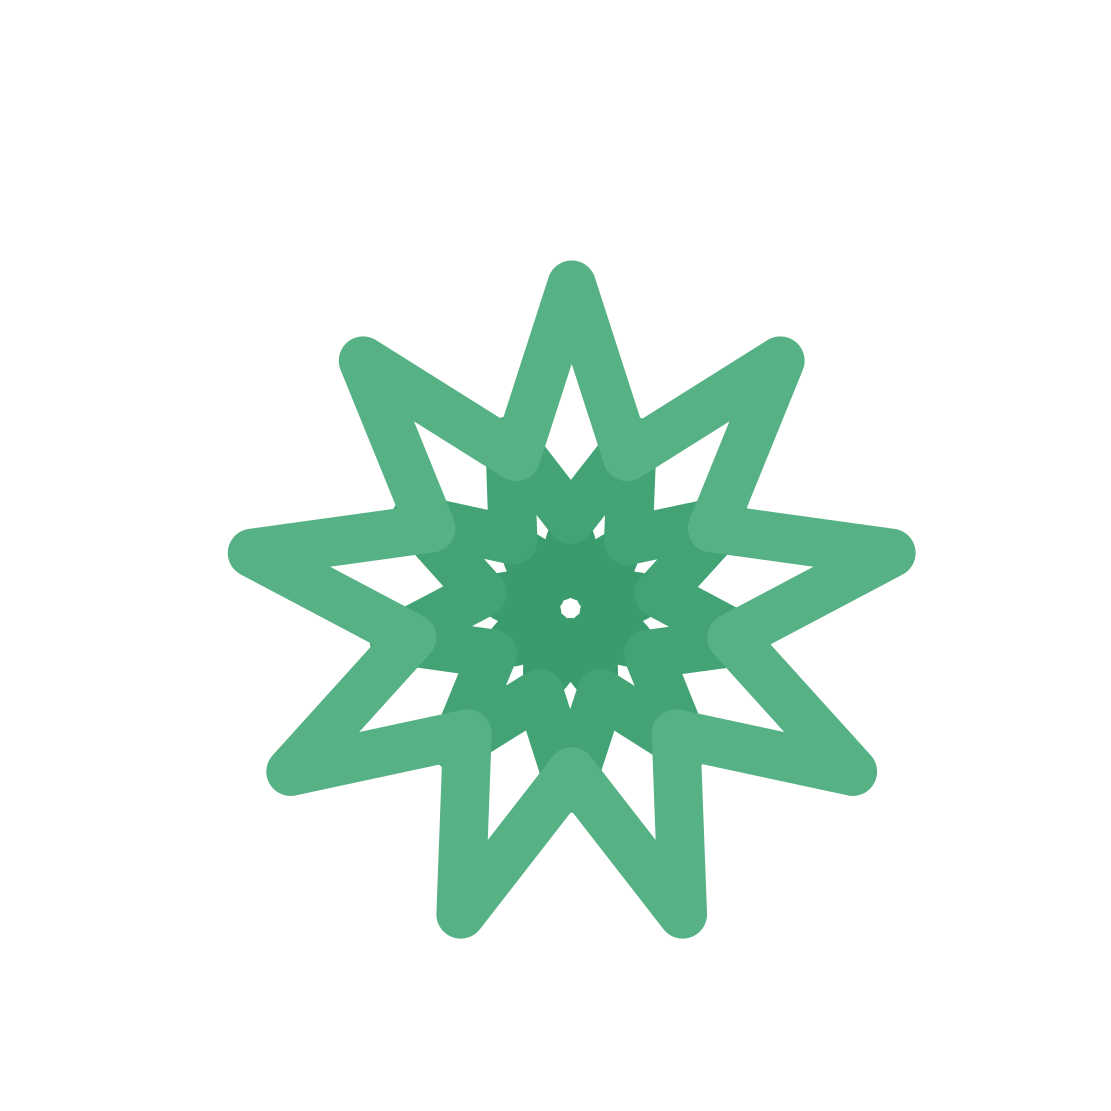 Glut neuron icon.png